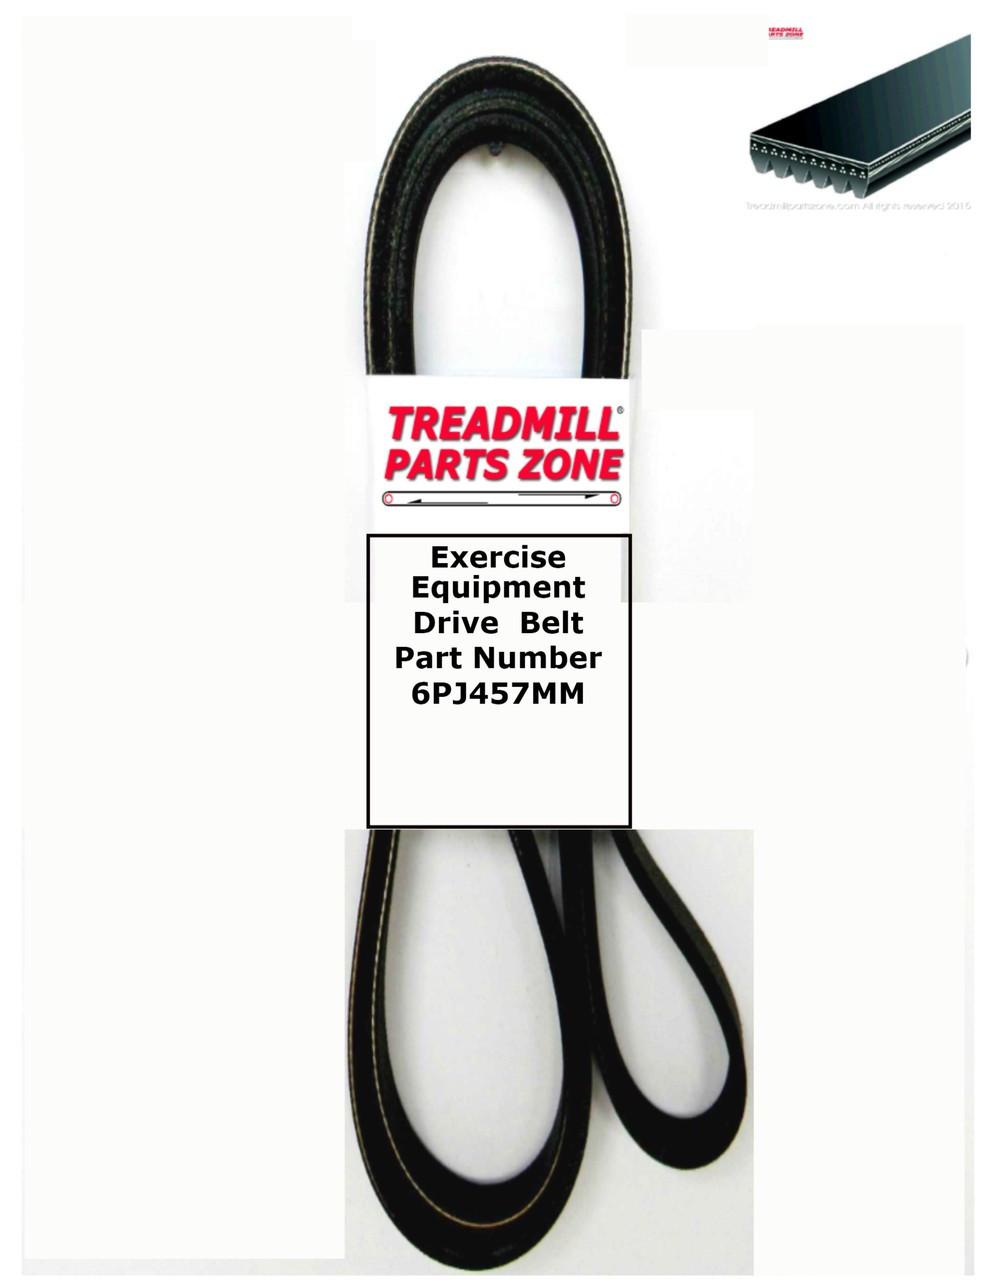 Exercise Equipment Drive  Belt Part Number 6PJ457MM